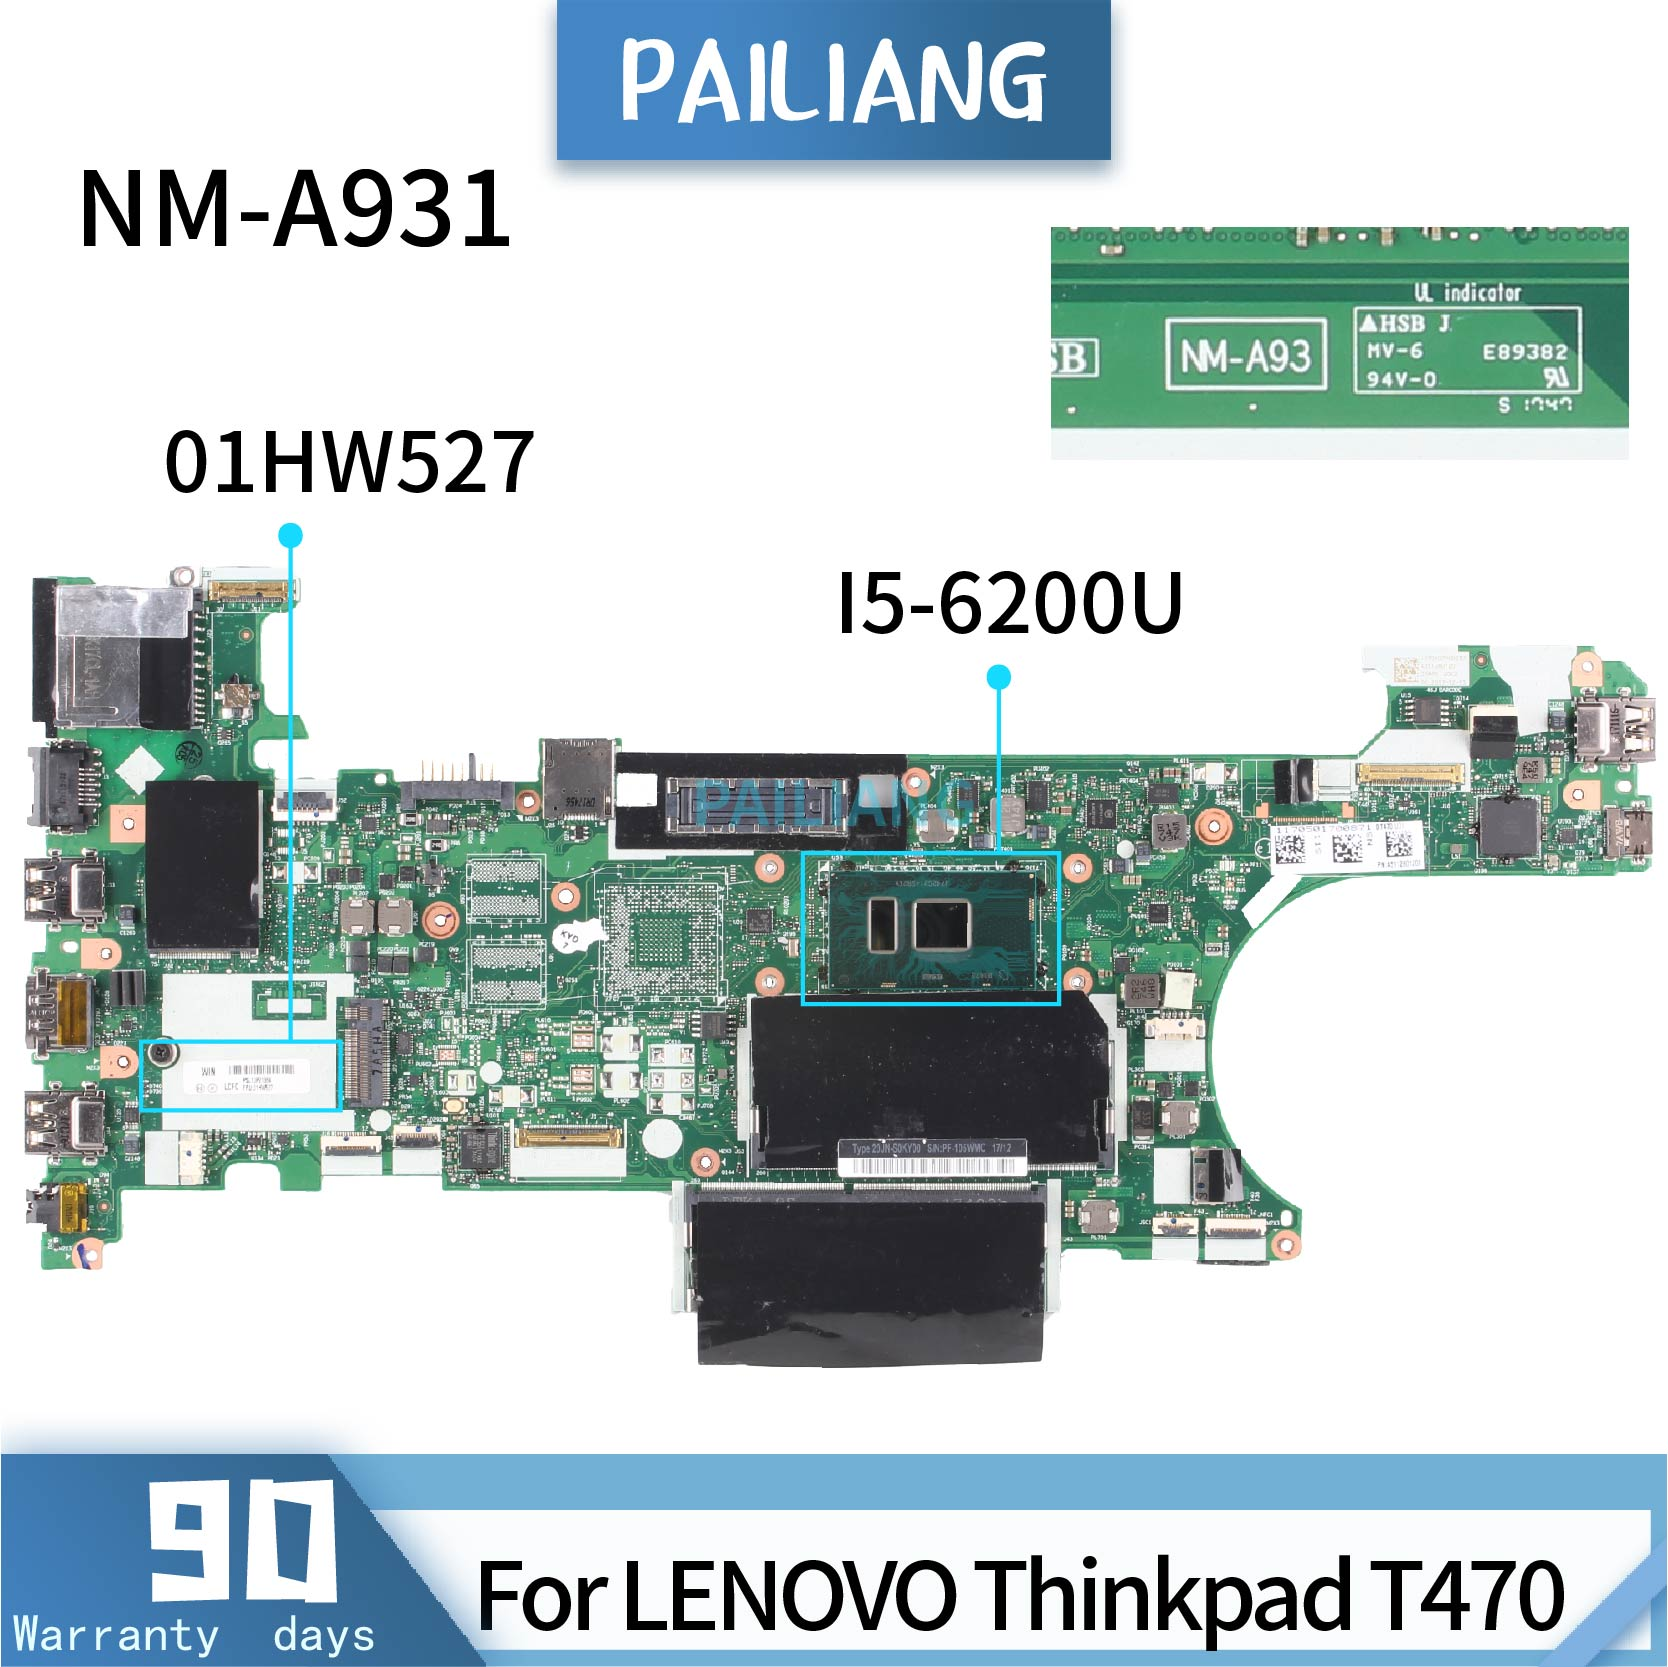 PAILIANG اللوحة الأم لأجهزة الكمبيوتر المحمول لينوفو ثينك باد T470 01HW527 NM-A931 اللوحة الرئيسية الأساسية SR2EY I5-6200U اختبار DDR3